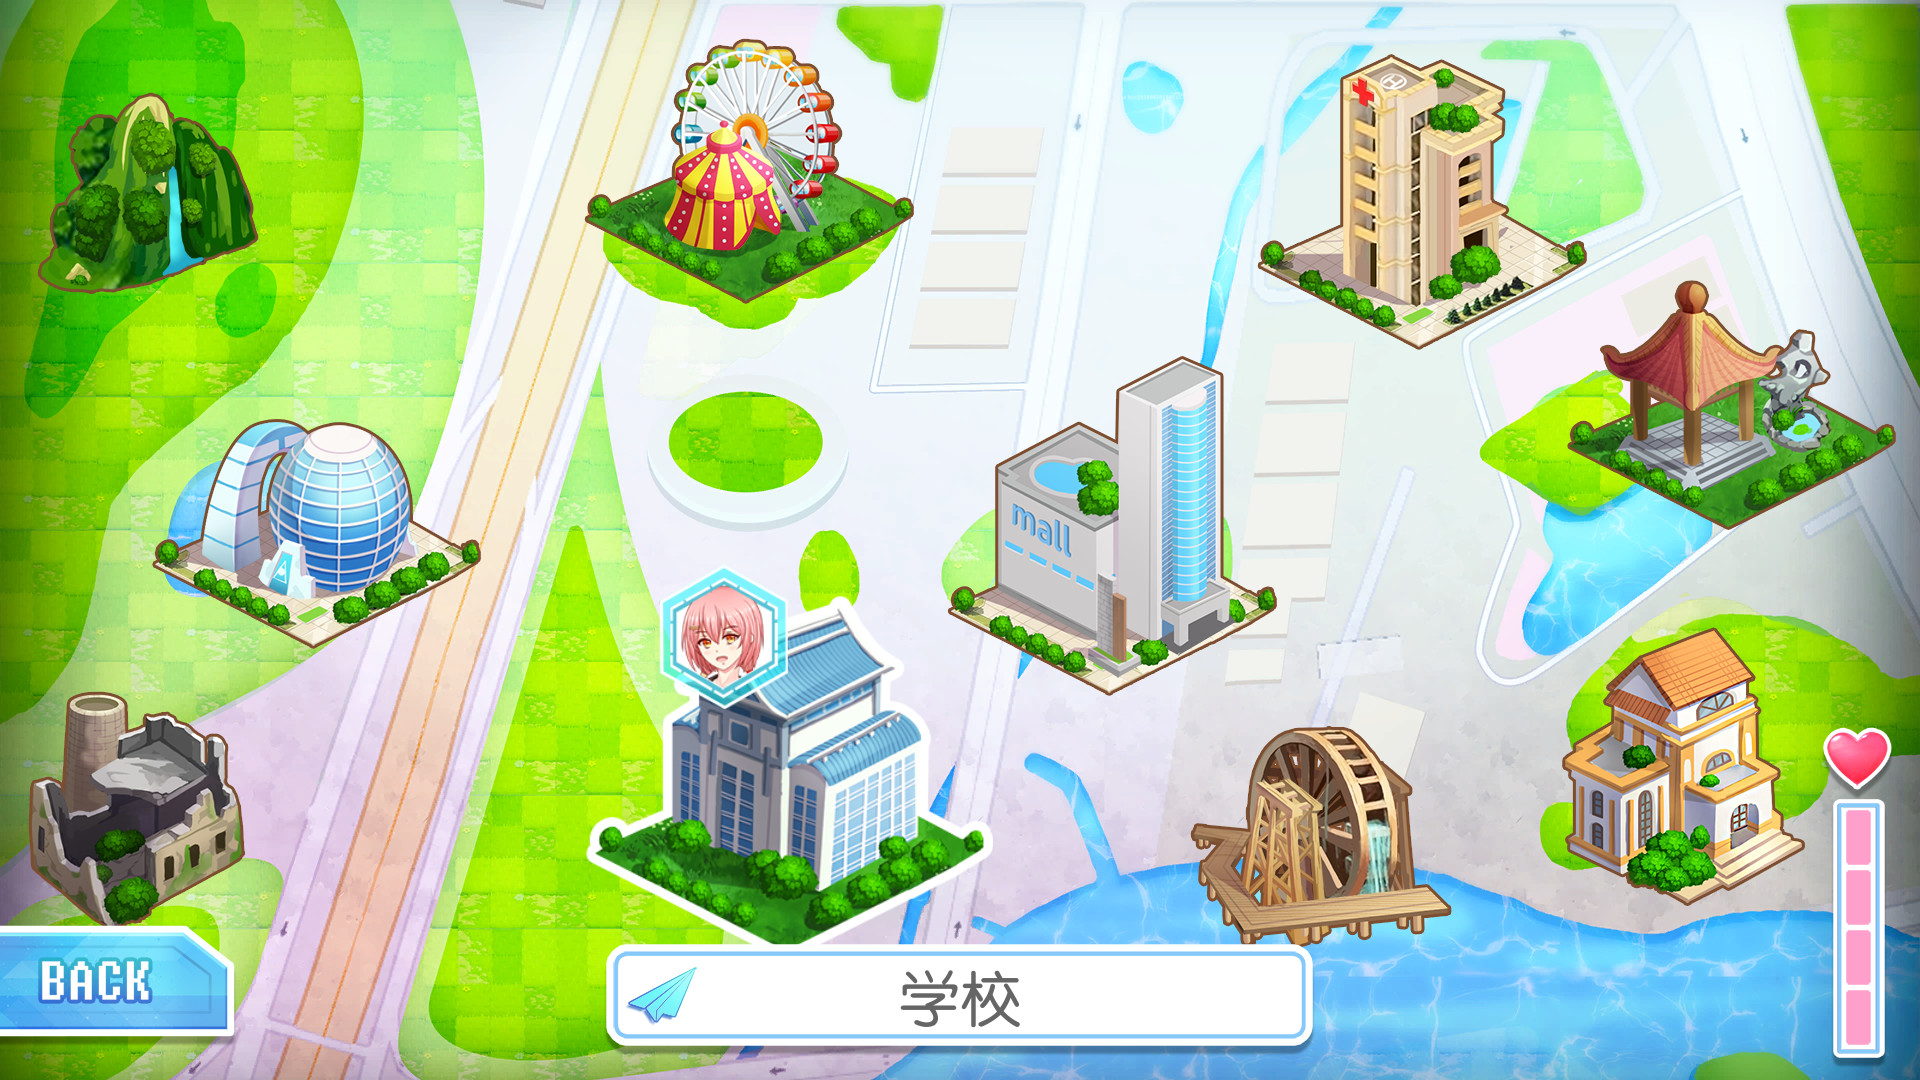 蔚蓝月下 Sapphire Moon screenshot